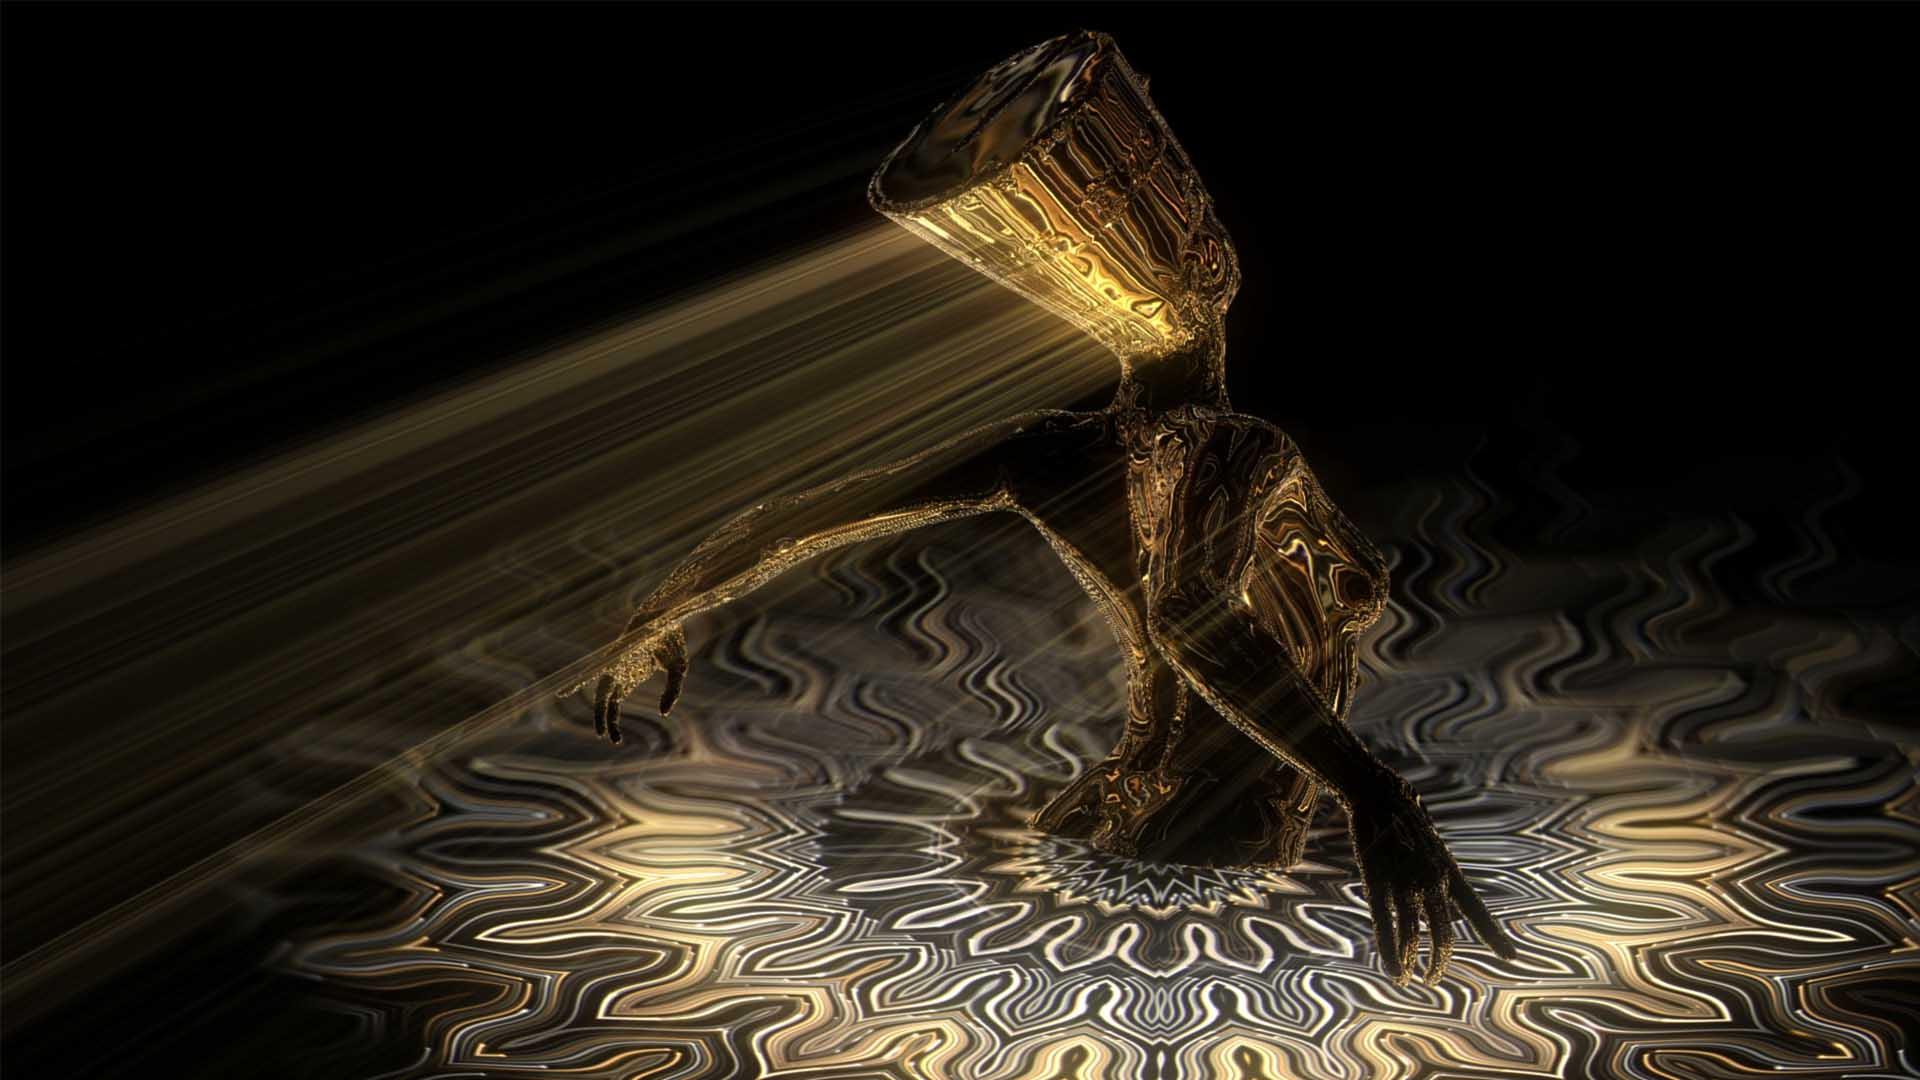 gold light video background madonna